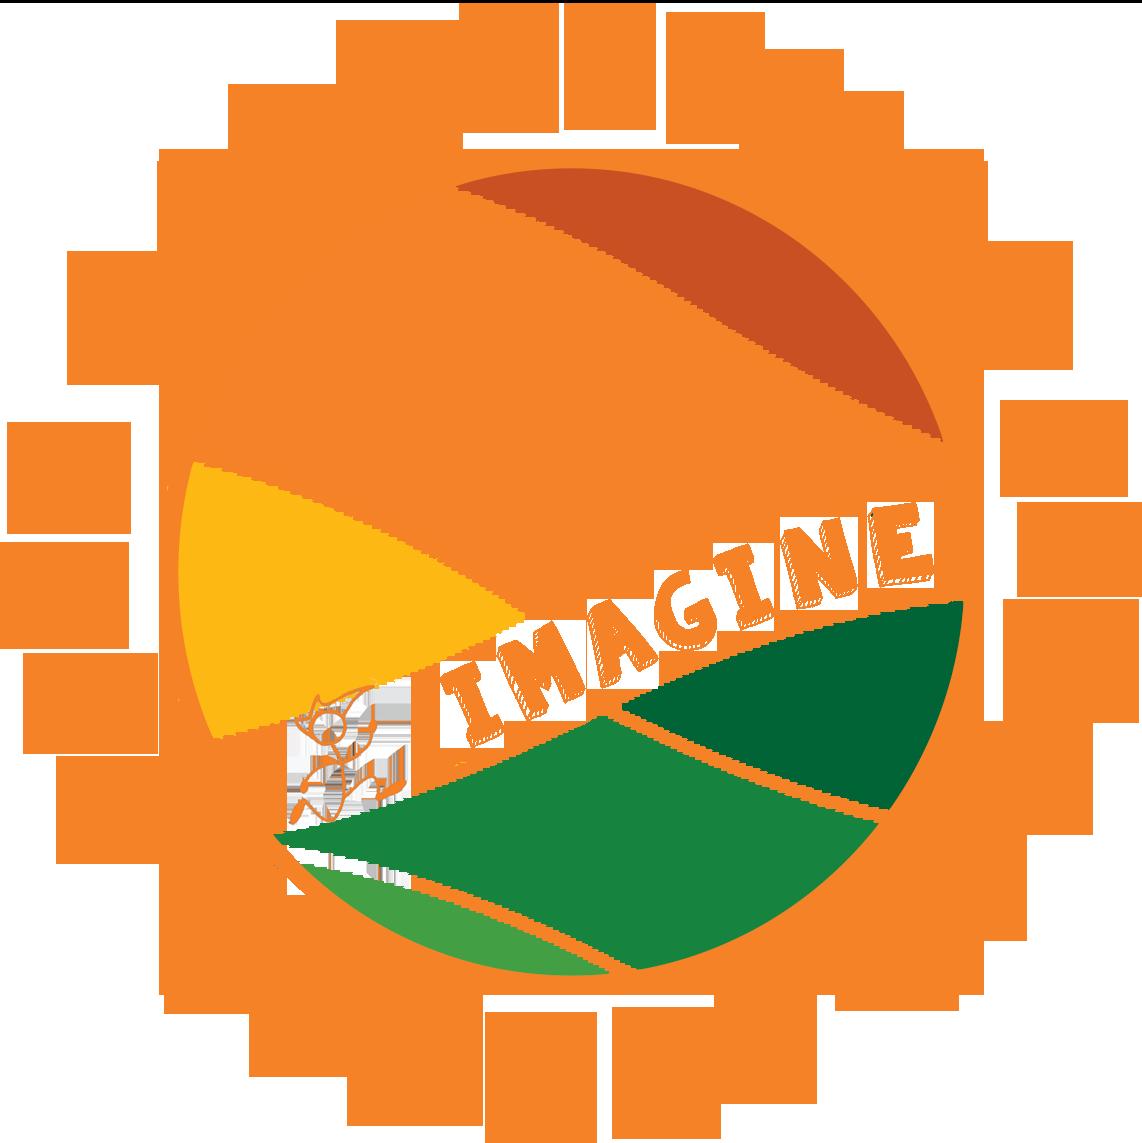 Hike clipart summer fun kid. Barnesville school camp